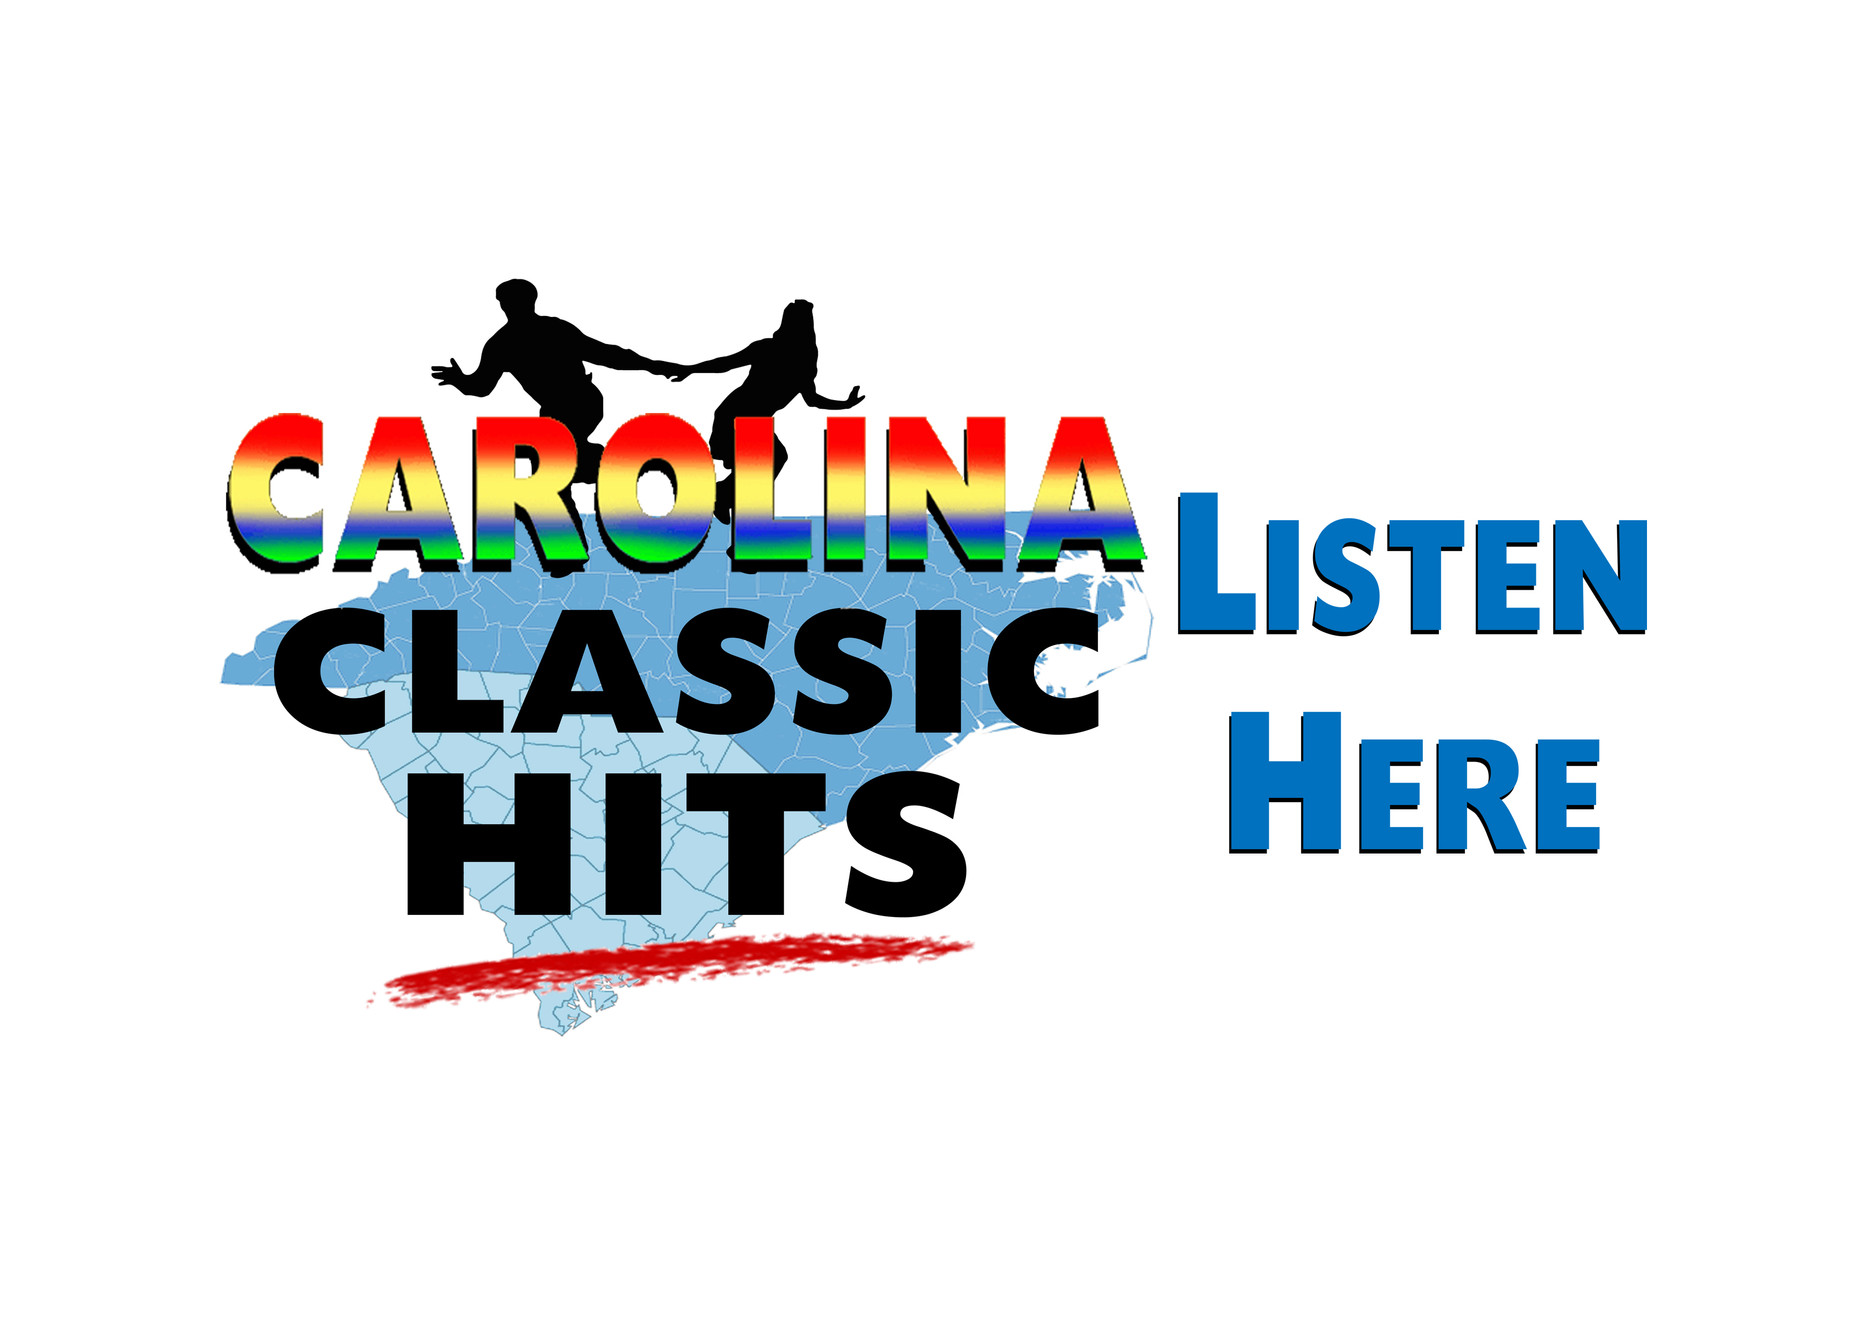 CCH Carolina Classic Hits Radio Station